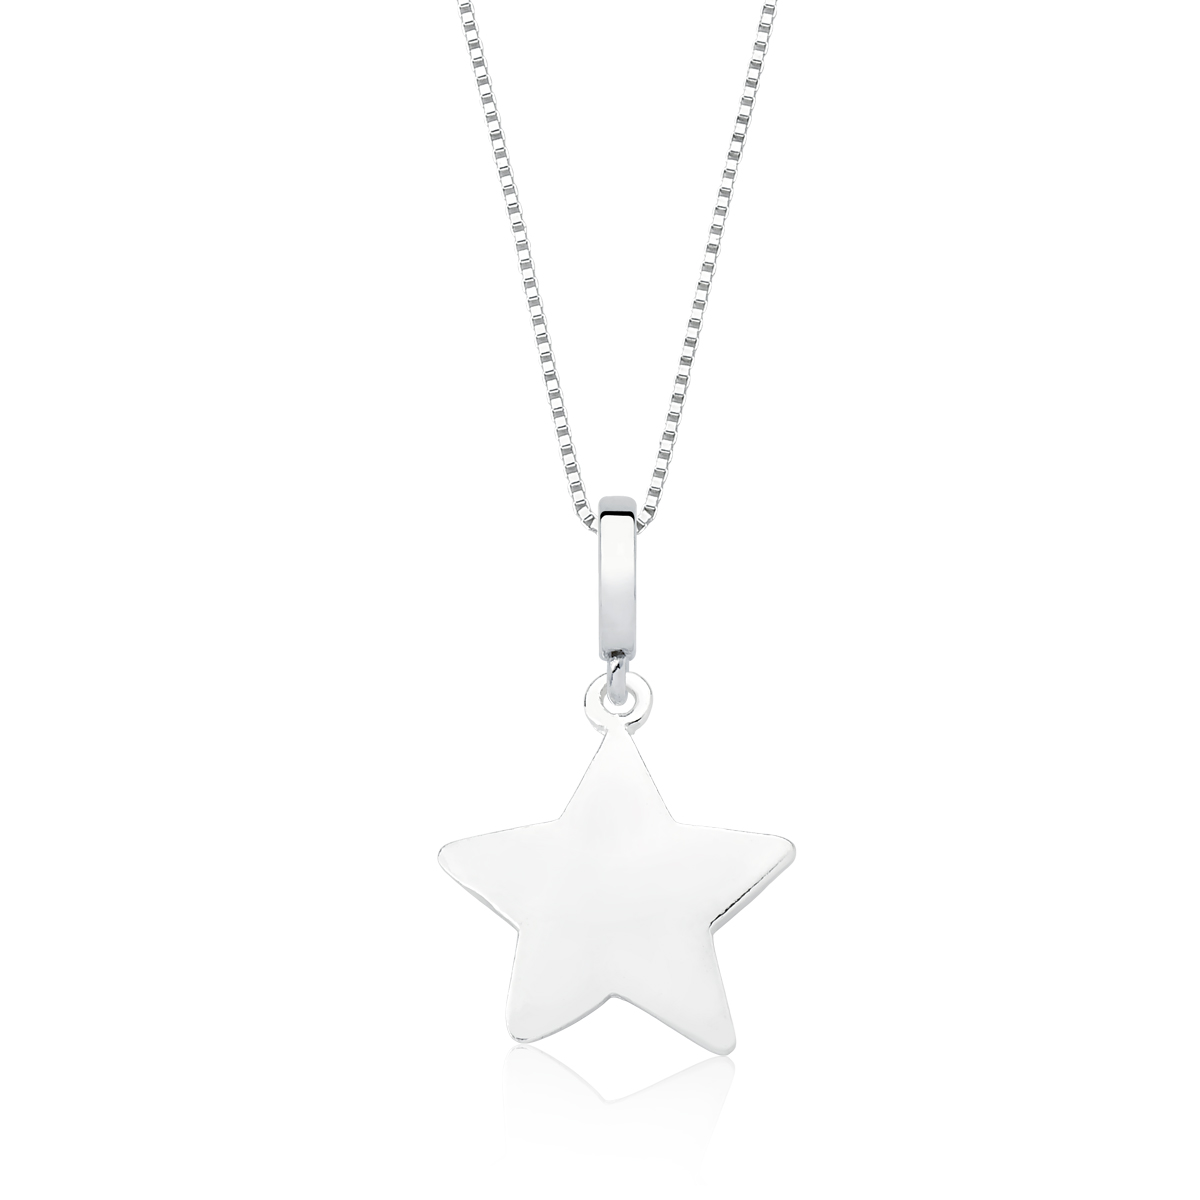 Conjunto Estrelas de Prata